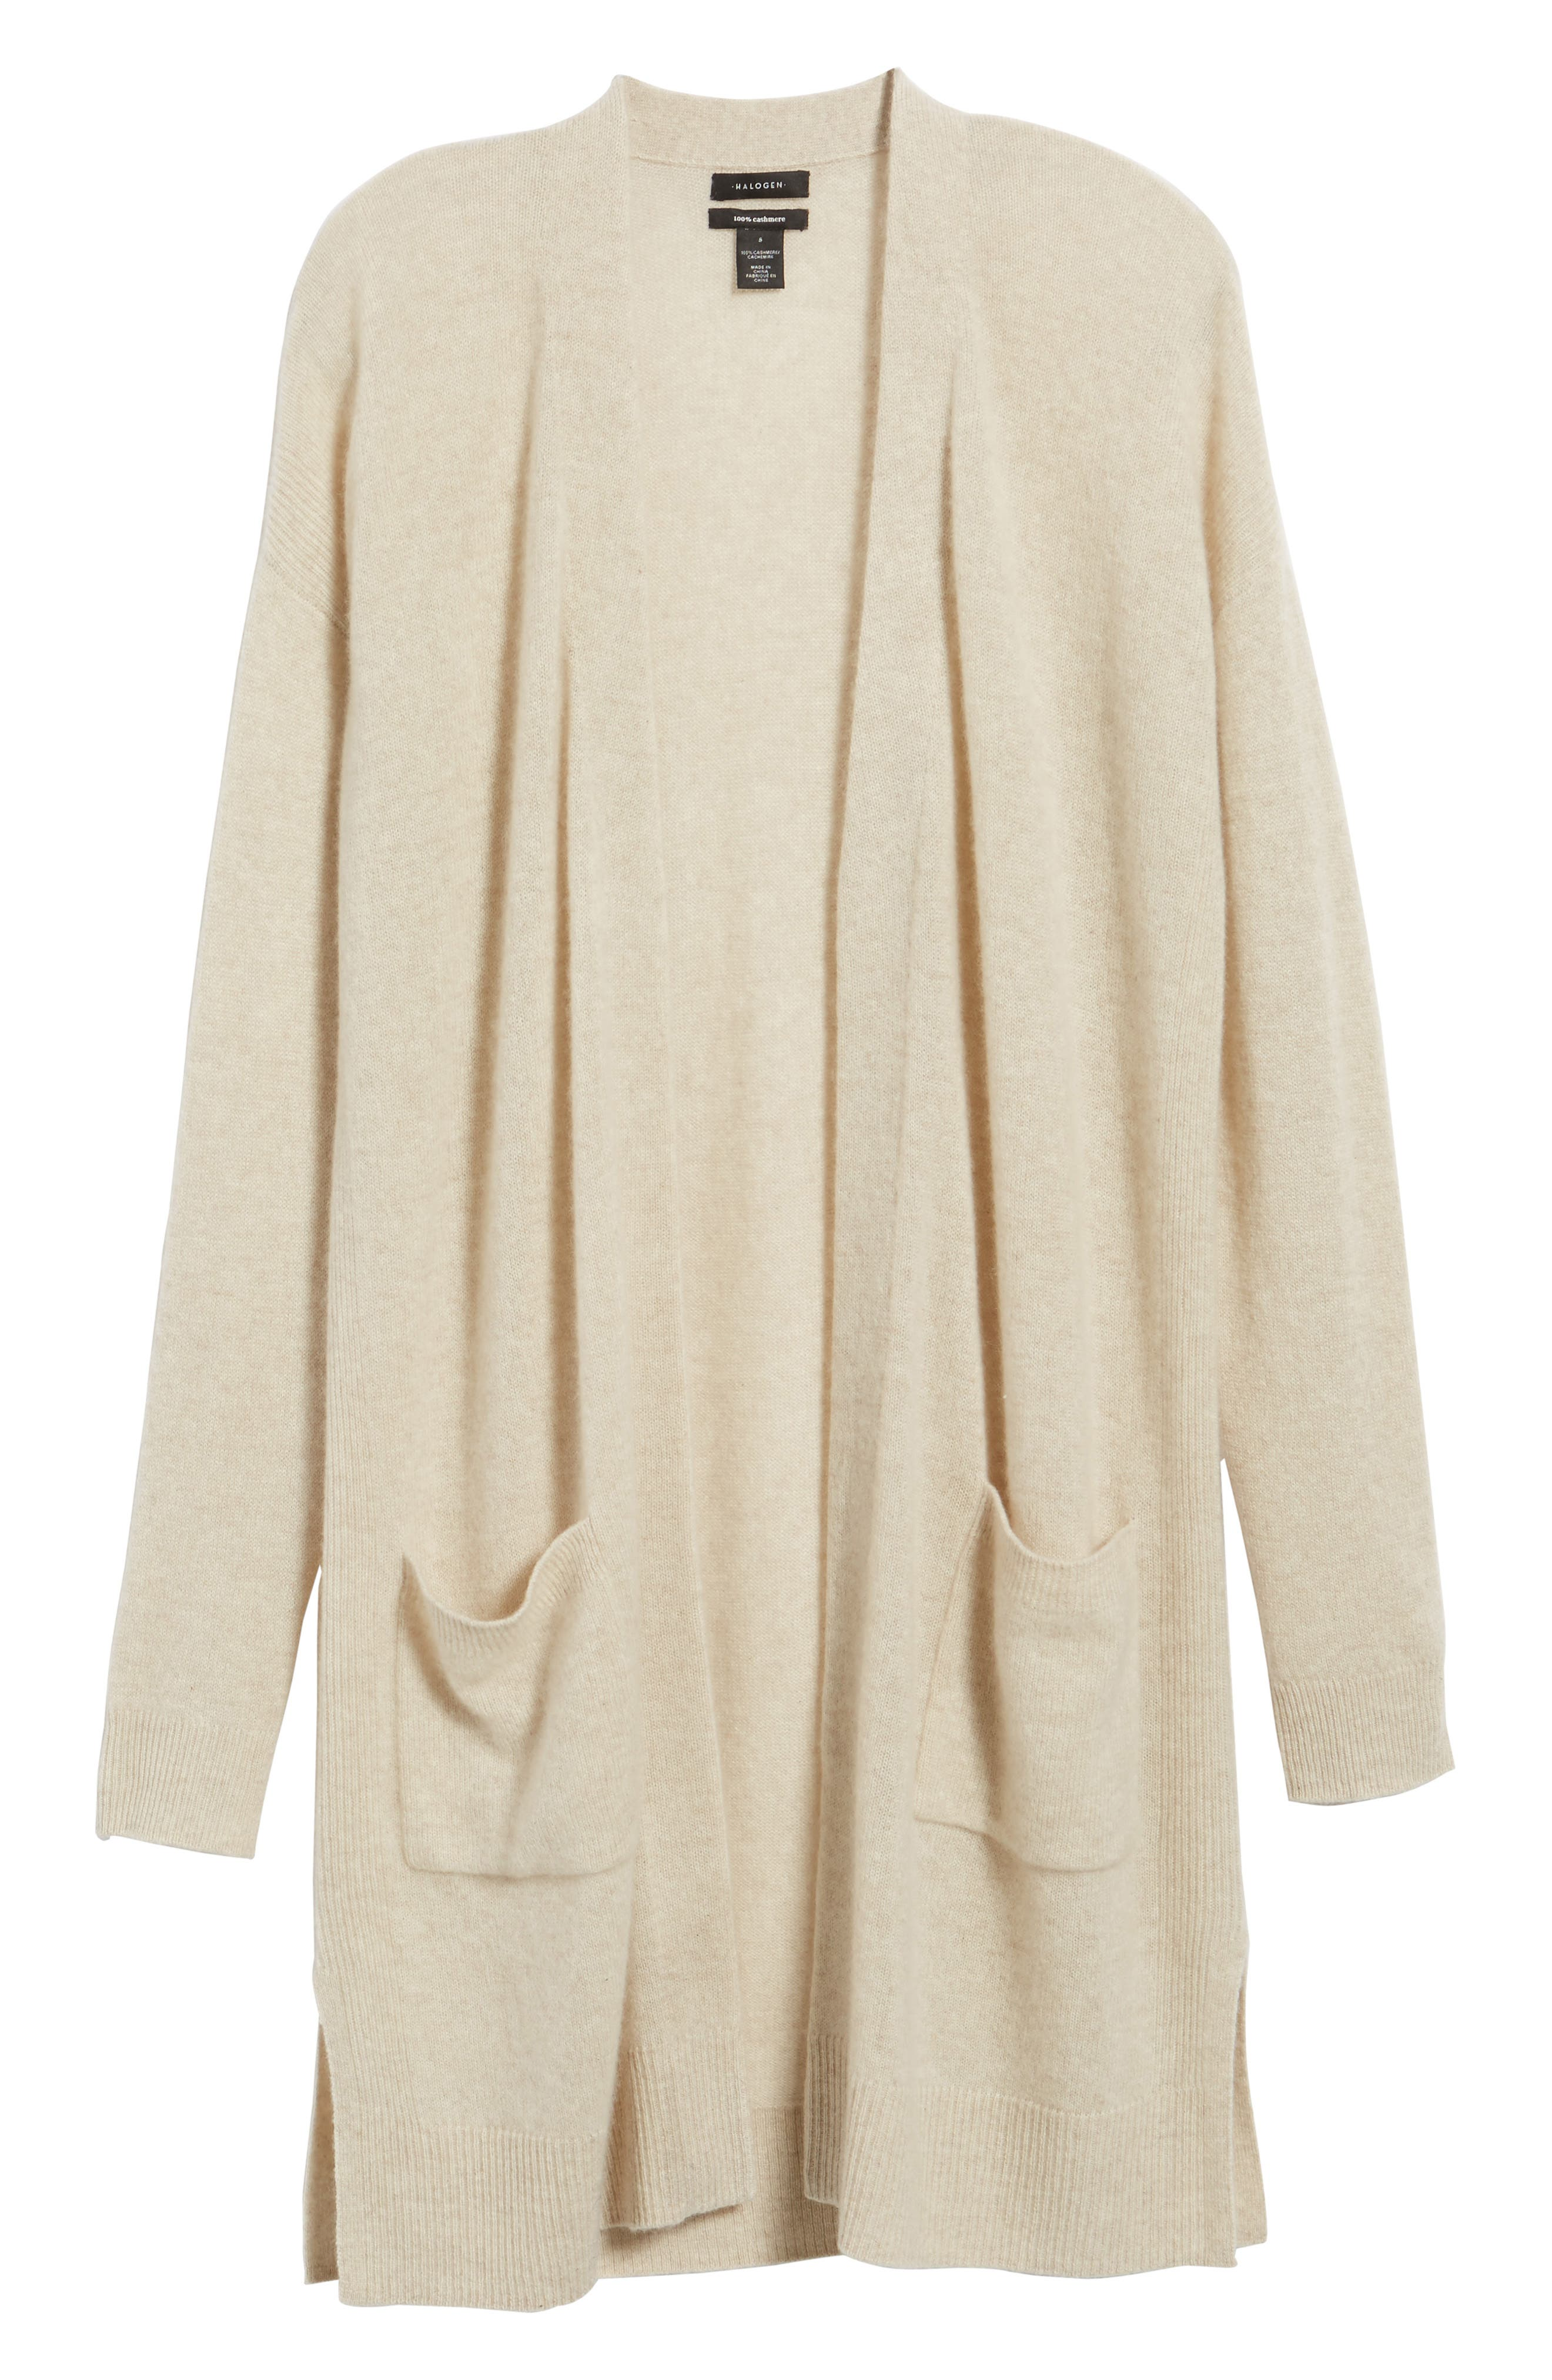 Main Image - Halogen® Rib Knit Wool & Cashmere Cardigan (Regular & Petite)